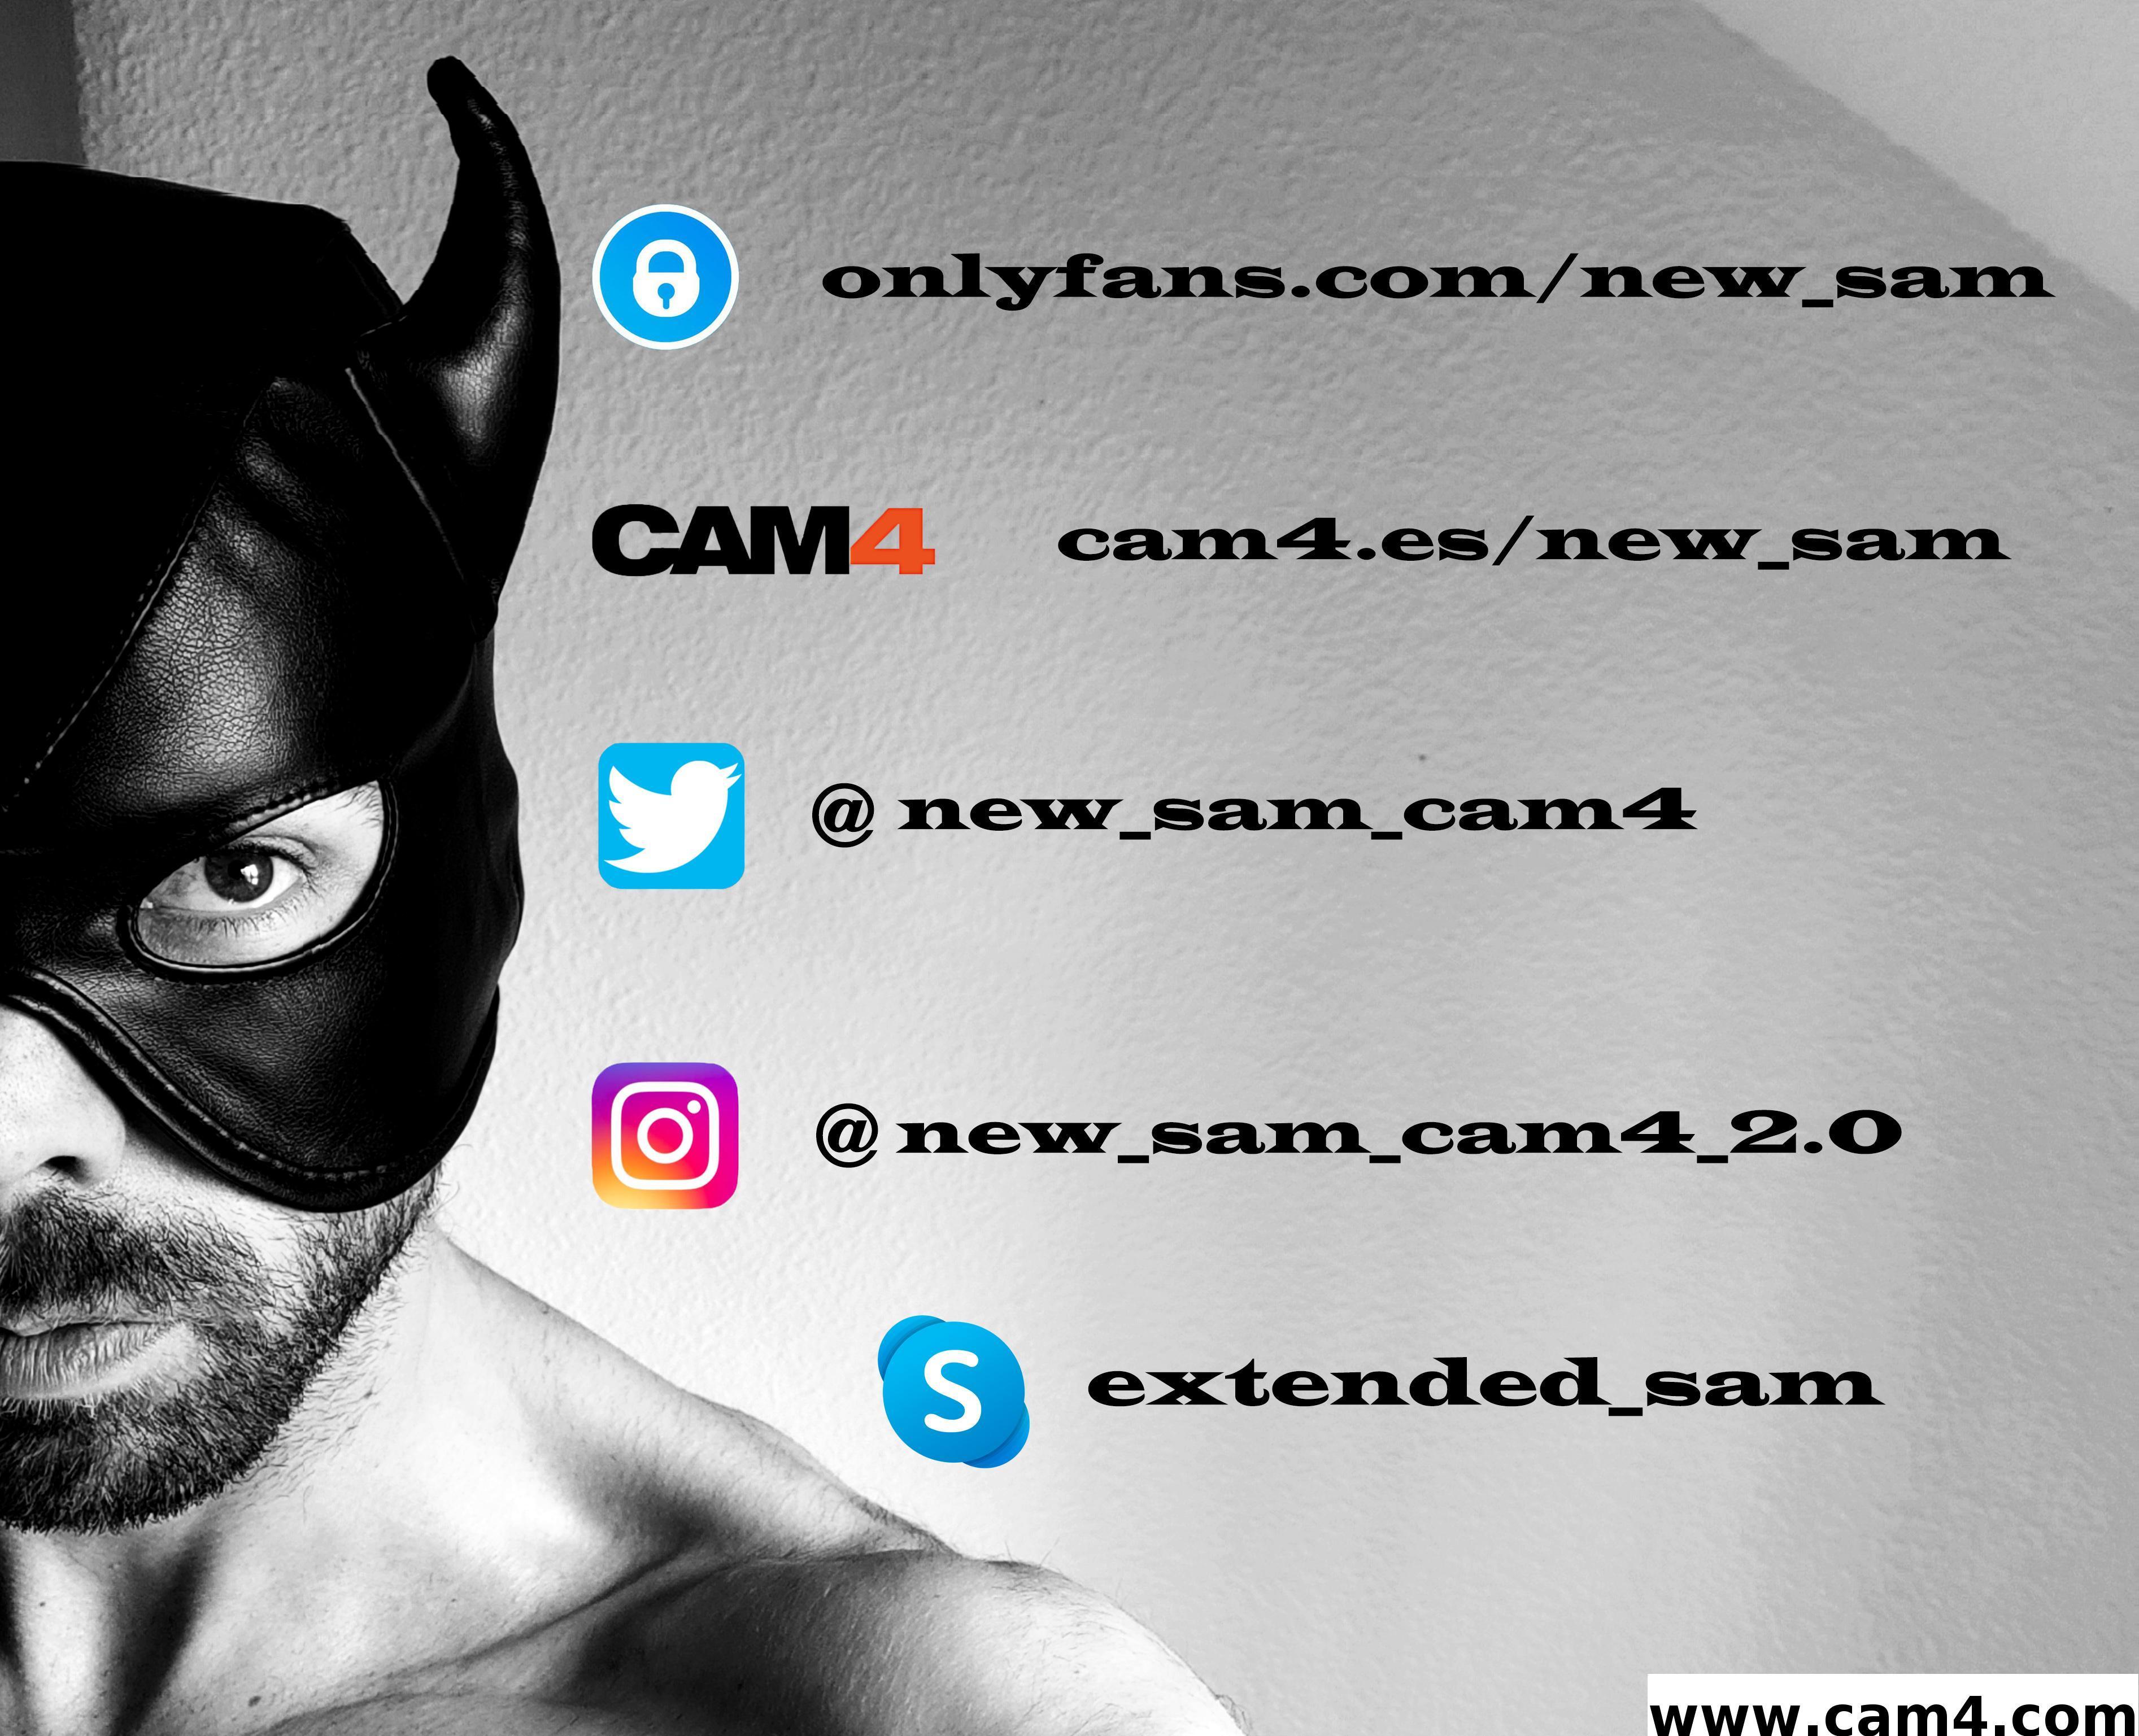 New sam?s=36wyn3ucnxhiur7yyy7kcbgicyesm2fbh8qwehc4io8=